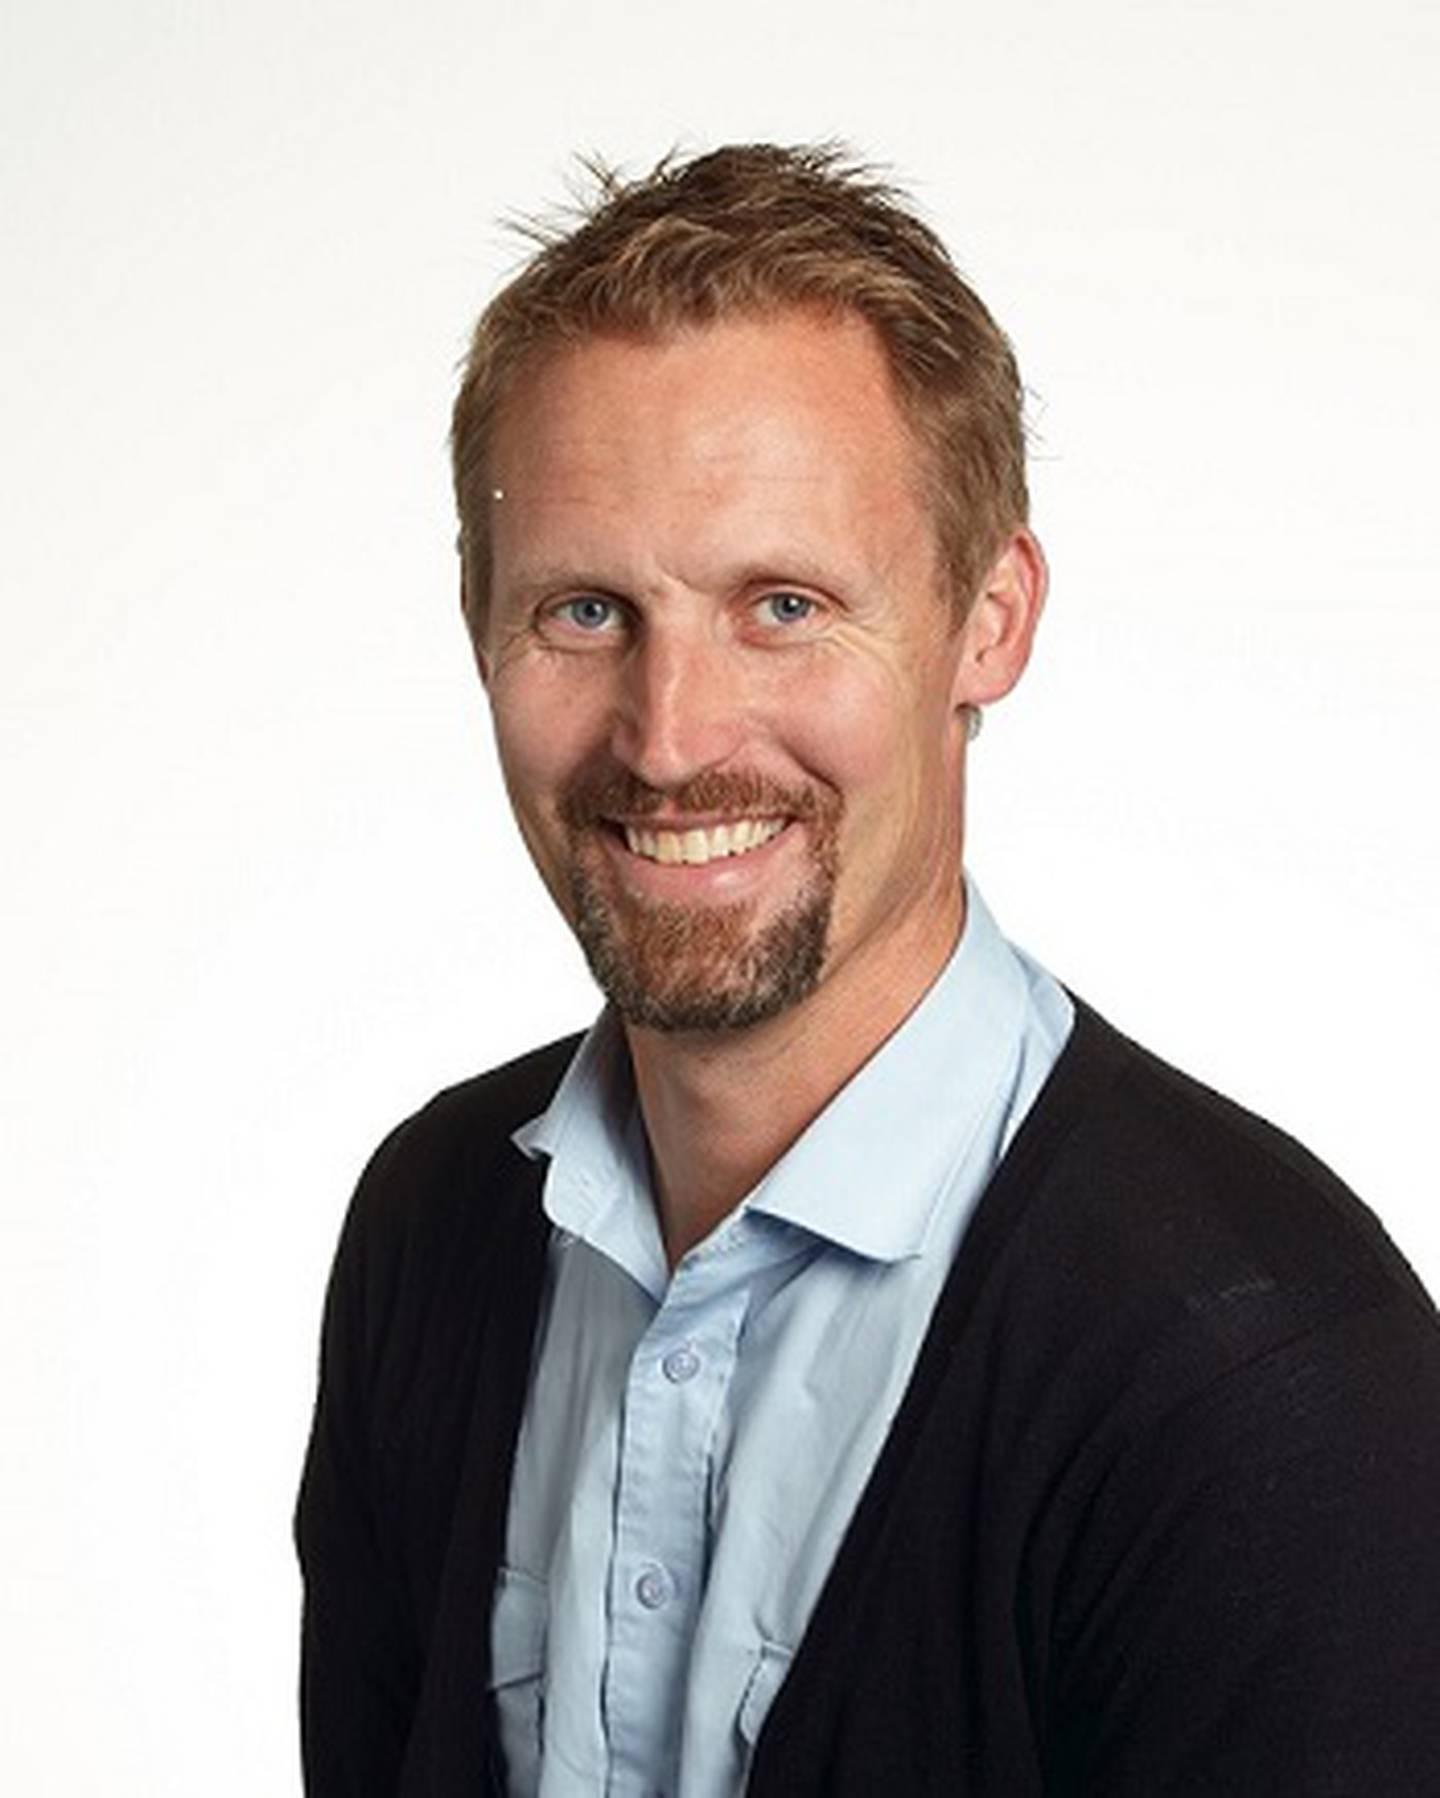 Ole Marius Hylland har skrevet bok om norske fylleord